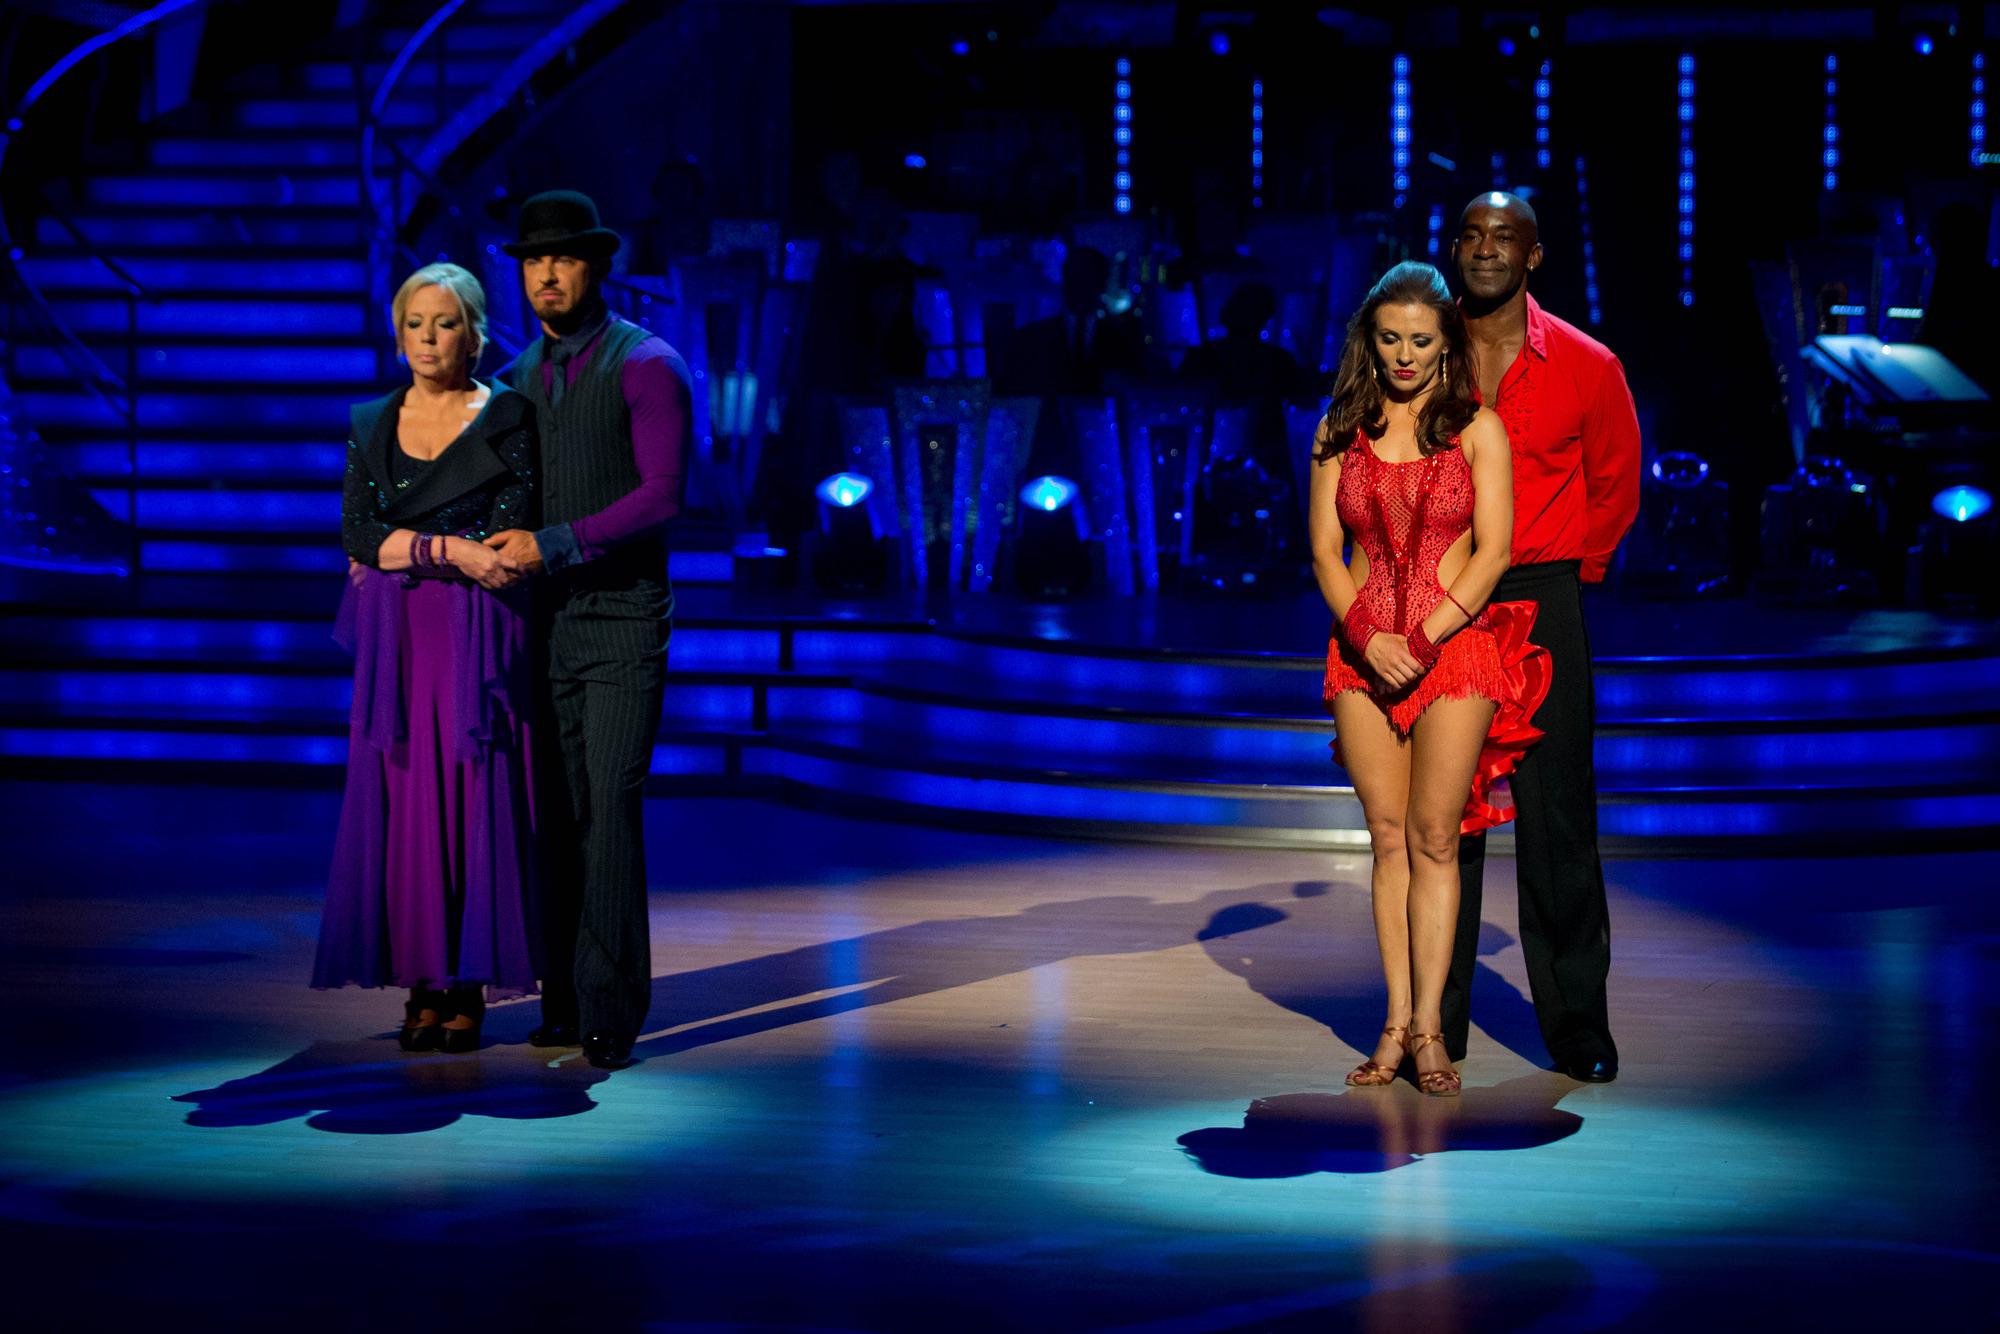 The bottom two couples Deborah Meaden, Robin Windsor, Anya Garnis, Patrick Robinson - (C) BBC - Photographer: Guy Levy